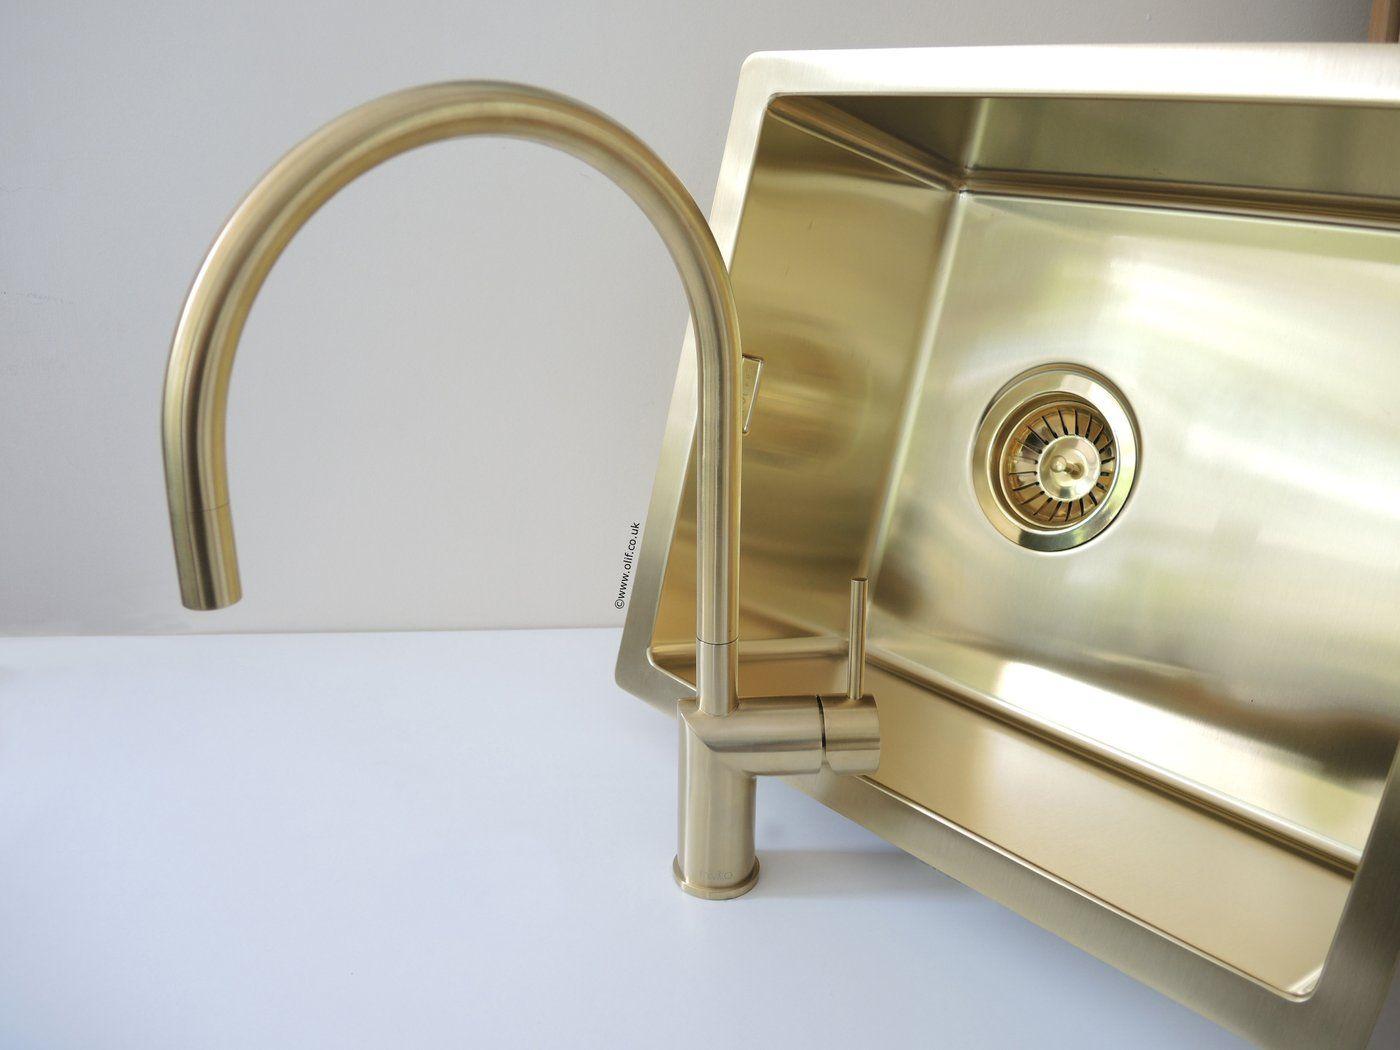 GROHE Brass Kitchen Taps for sale | eBay